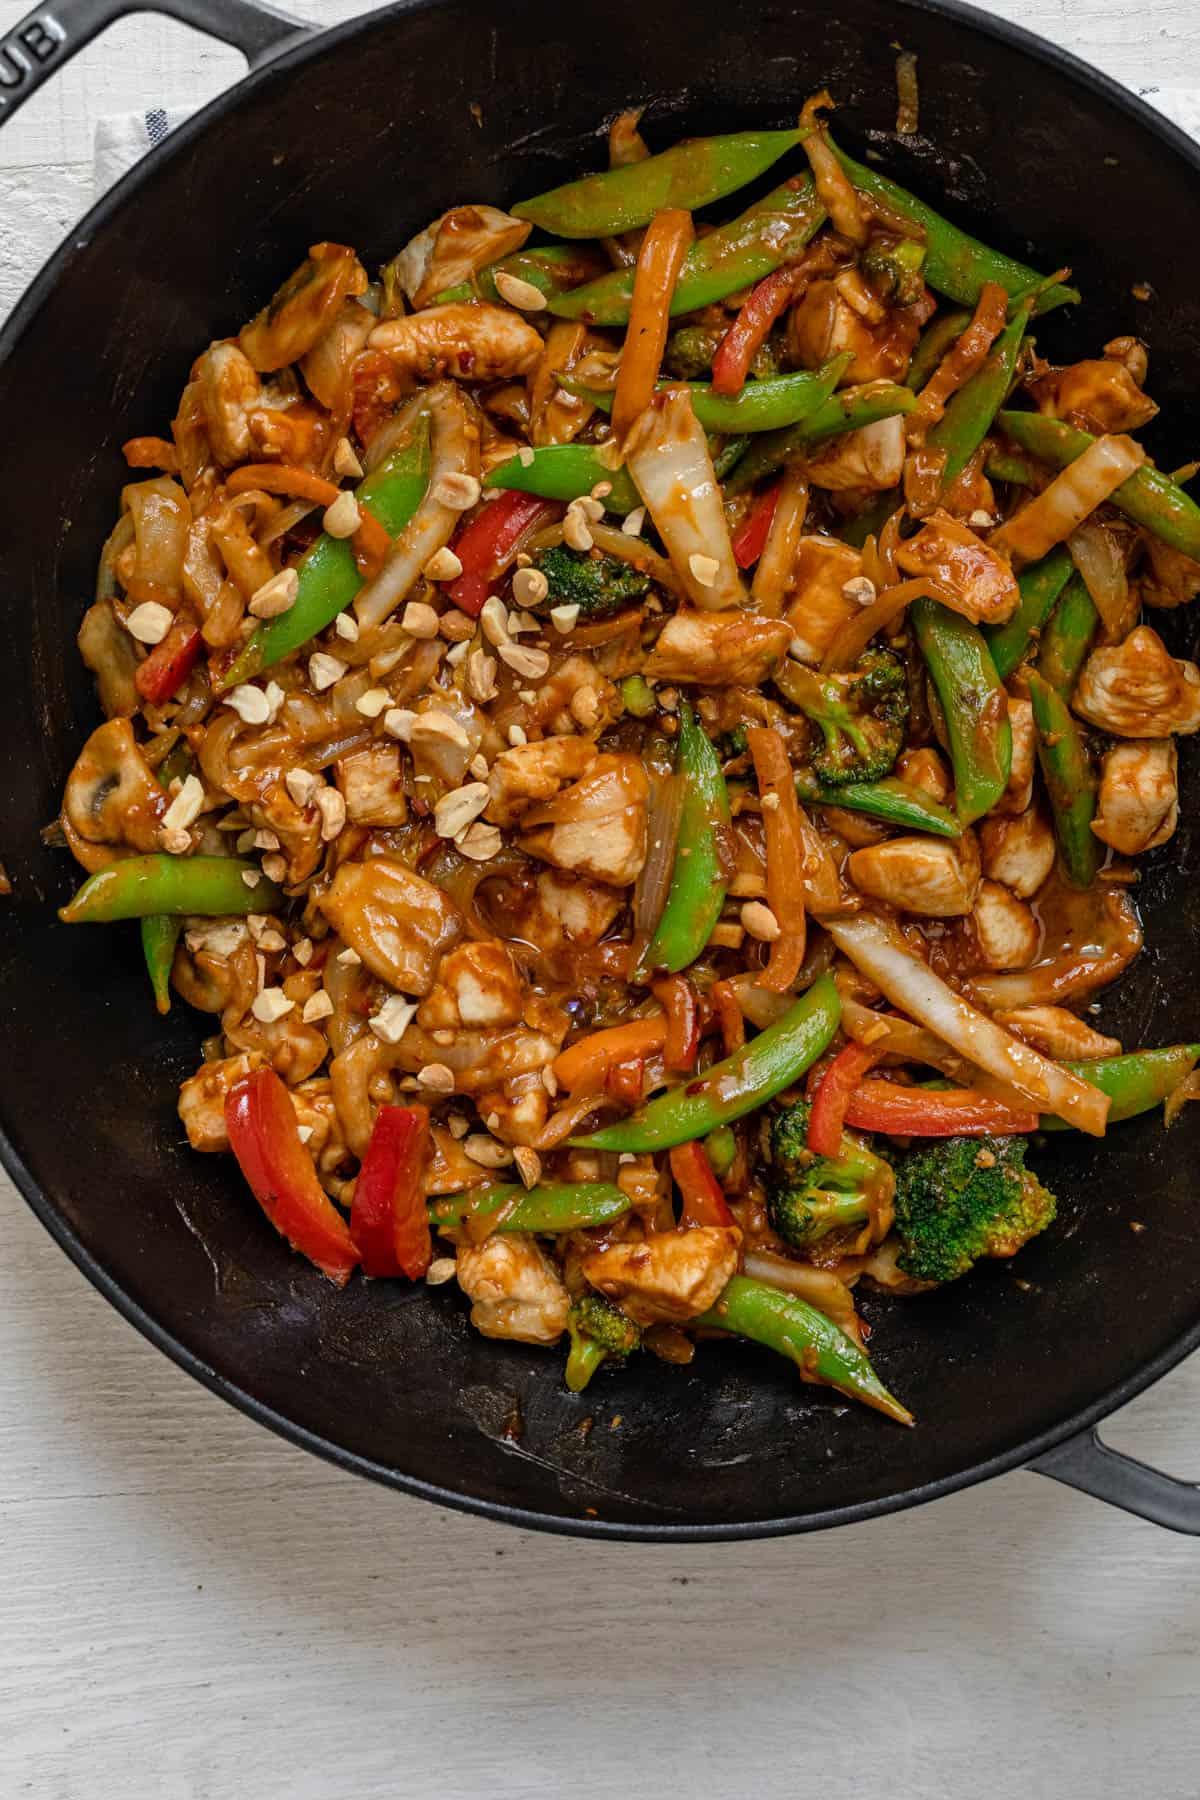 Large wok of thai peanut chicken stir fry